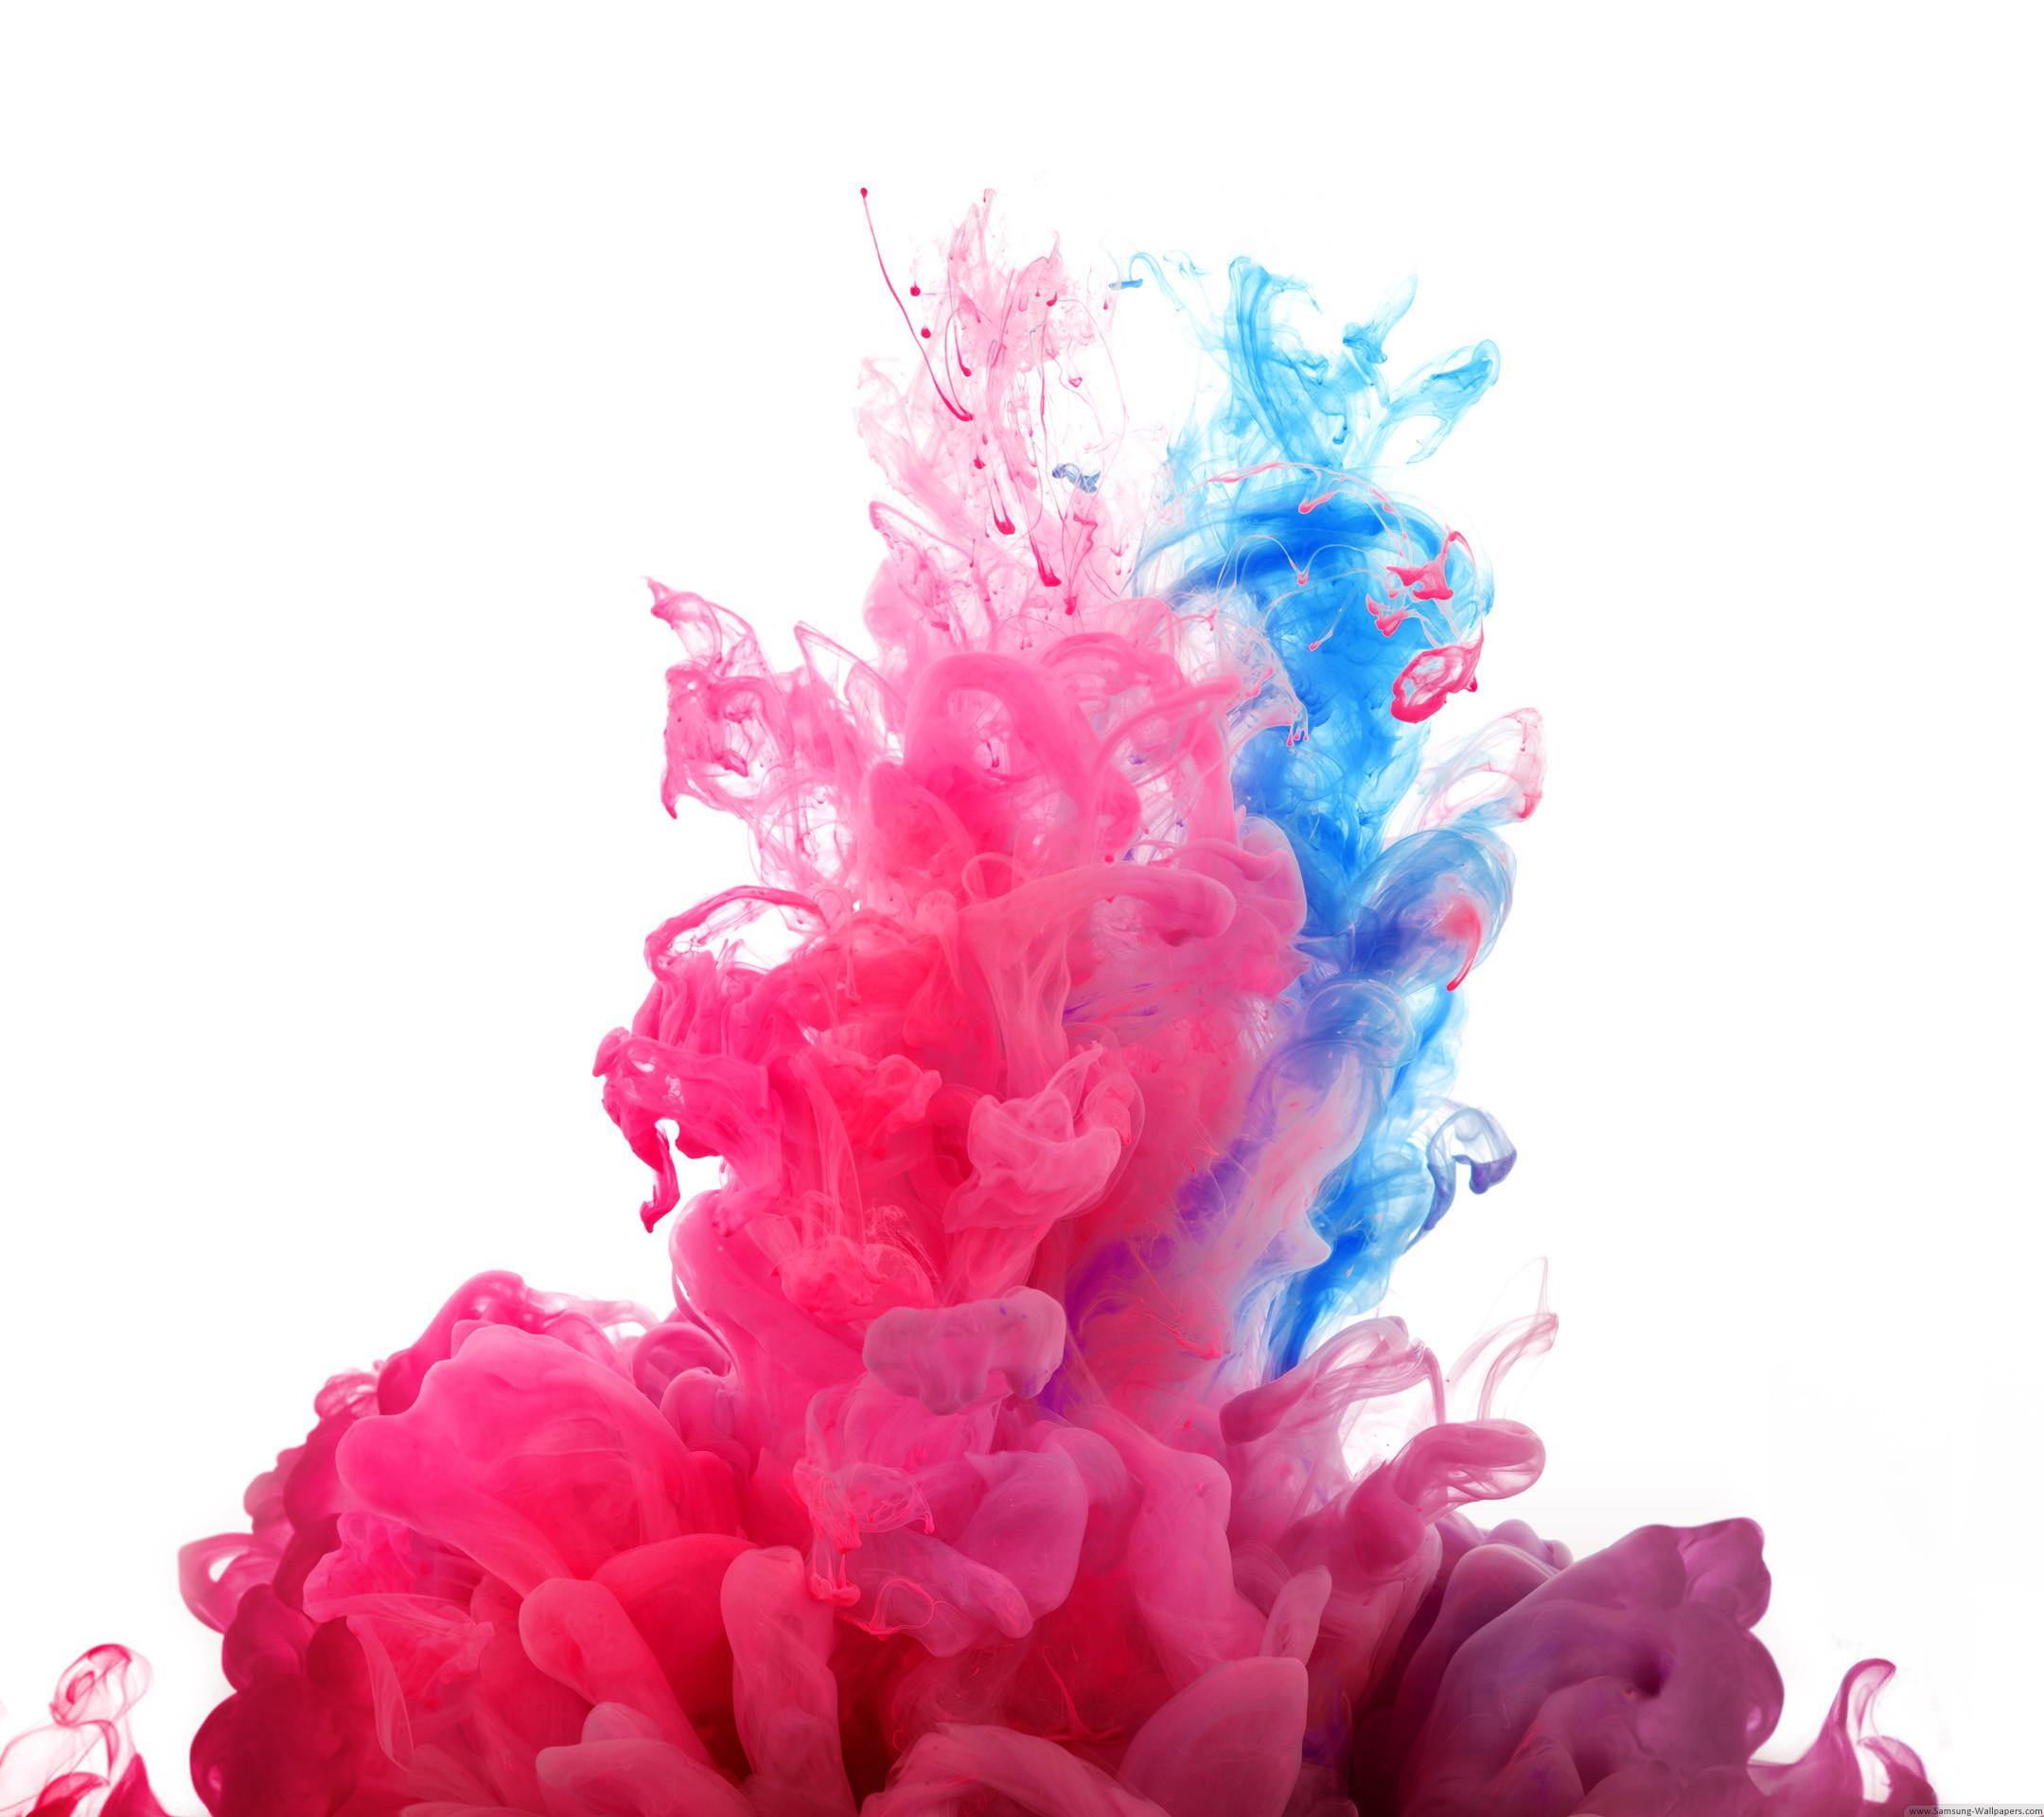 wallpaper.wiki-HD-Wallpapers-Colorful-Smoke-PIC-WPB0012333